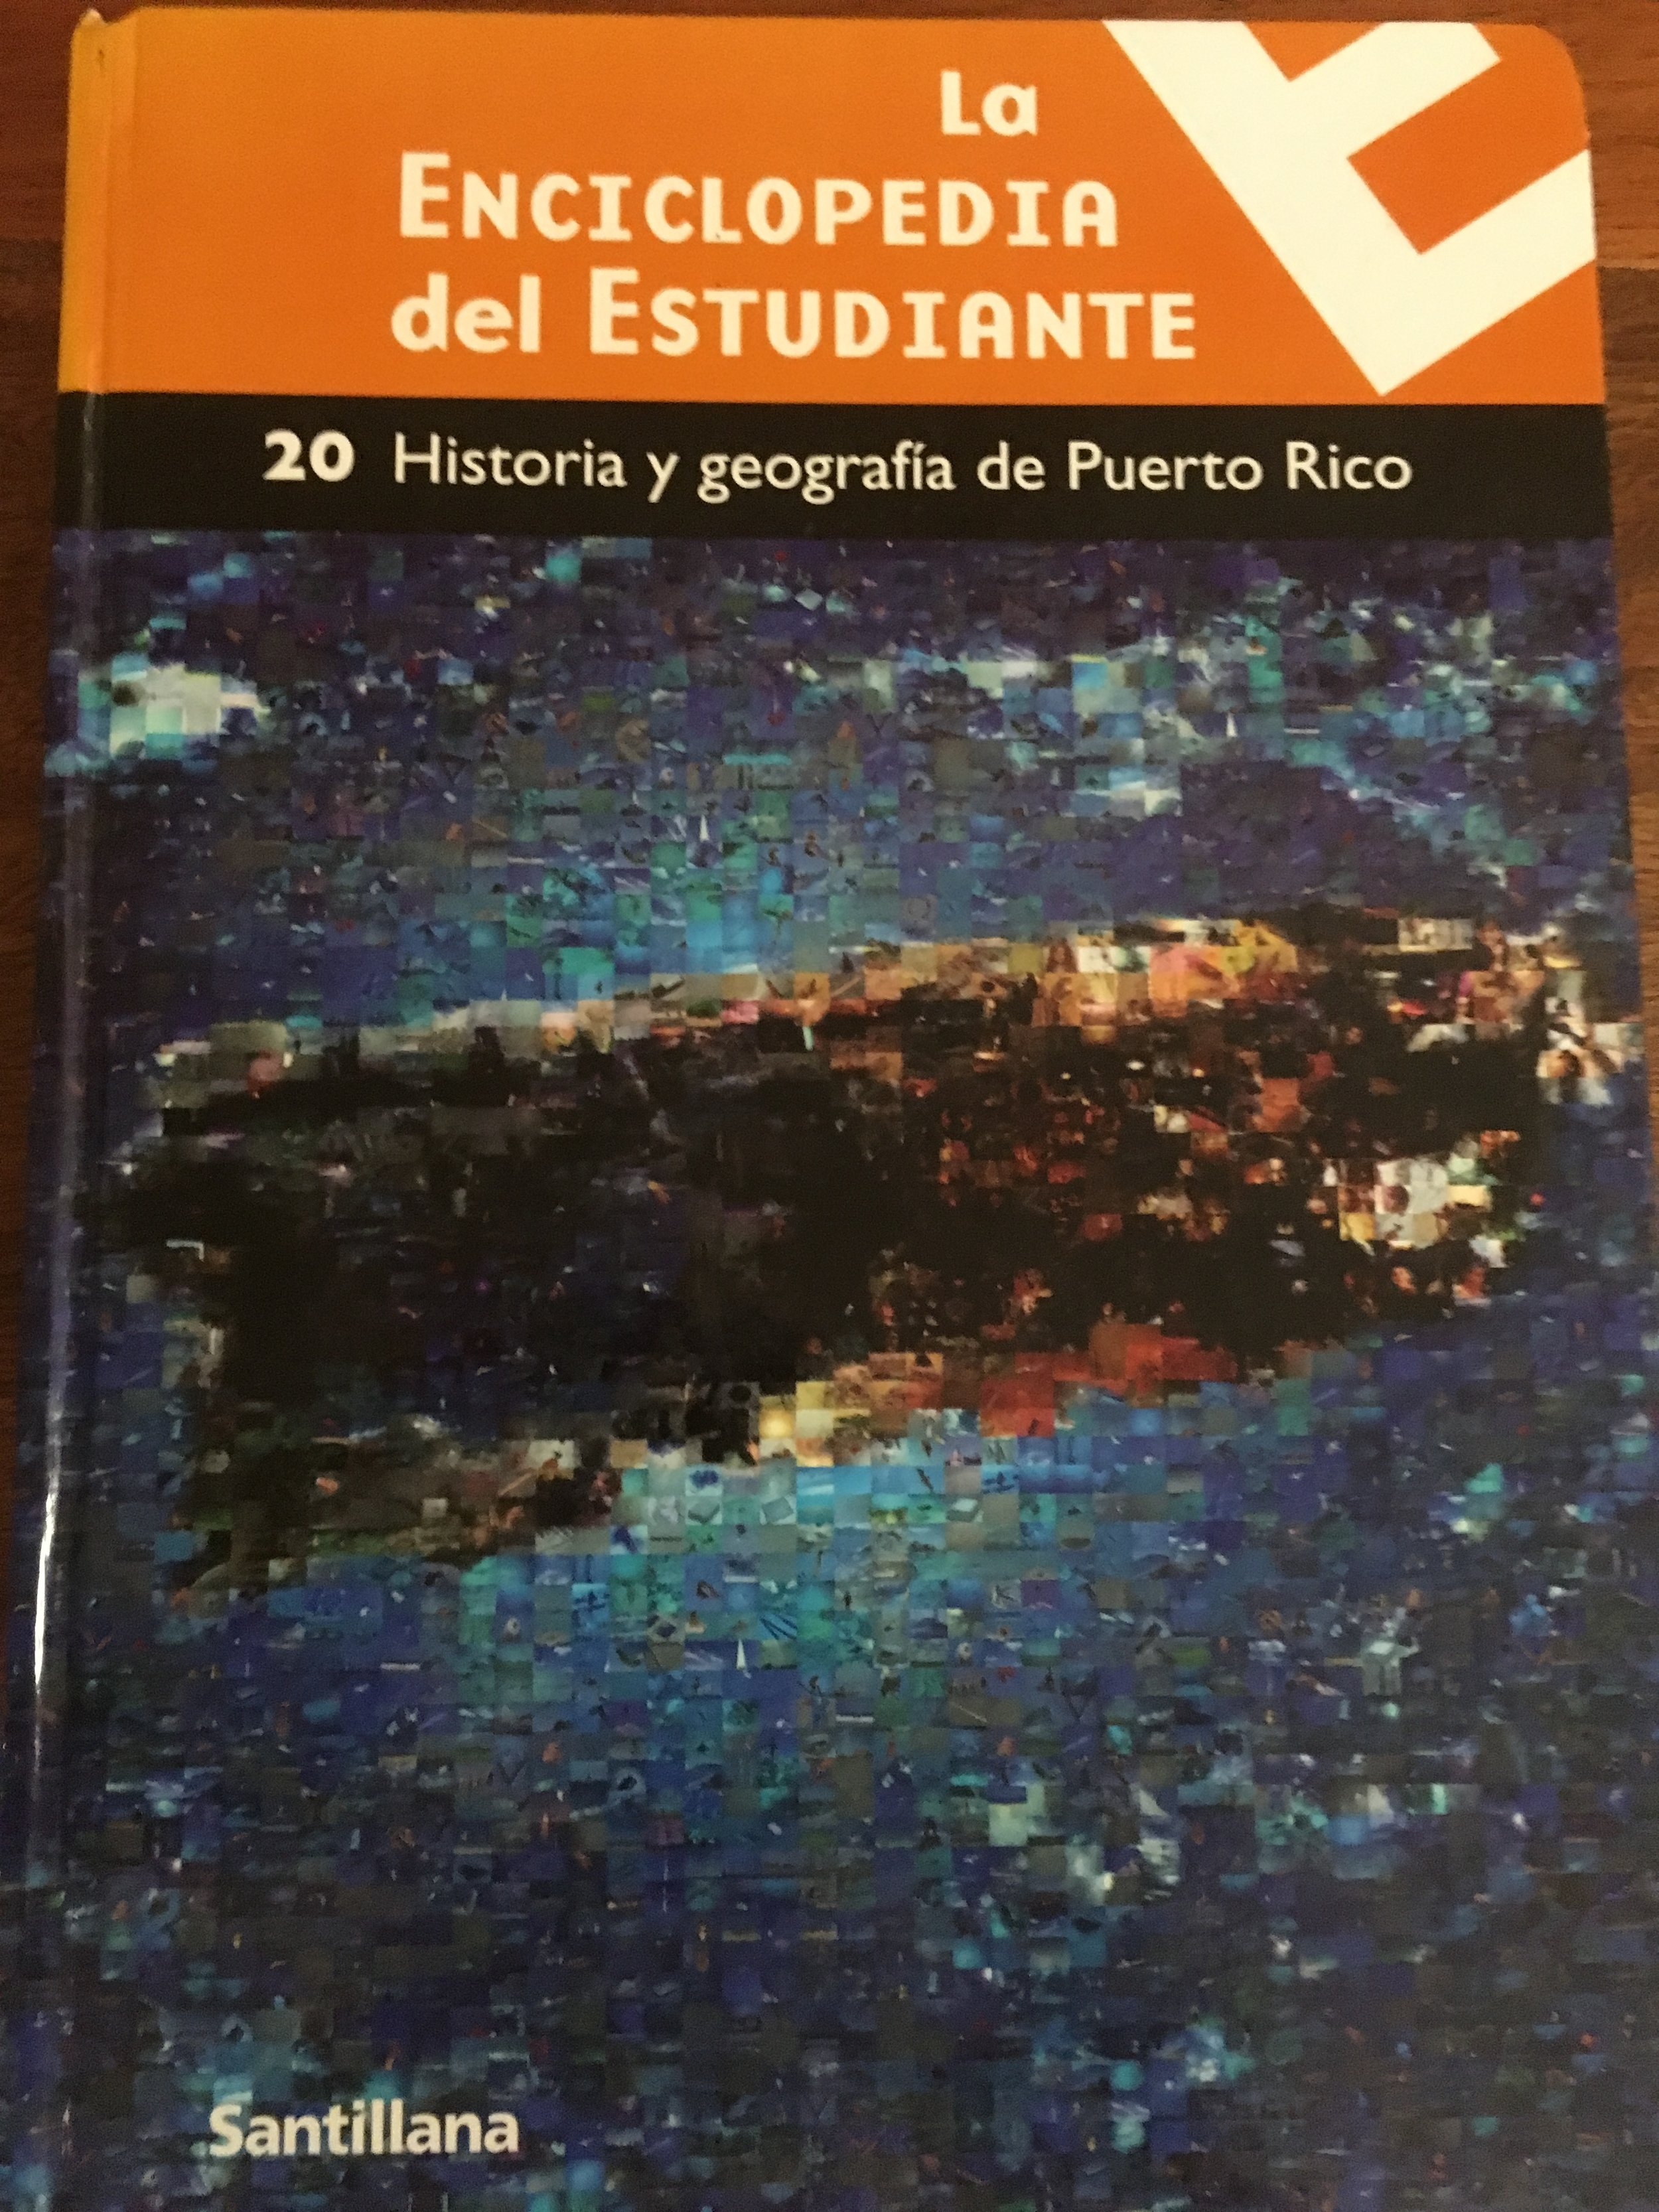 Enciclopedia.jpg